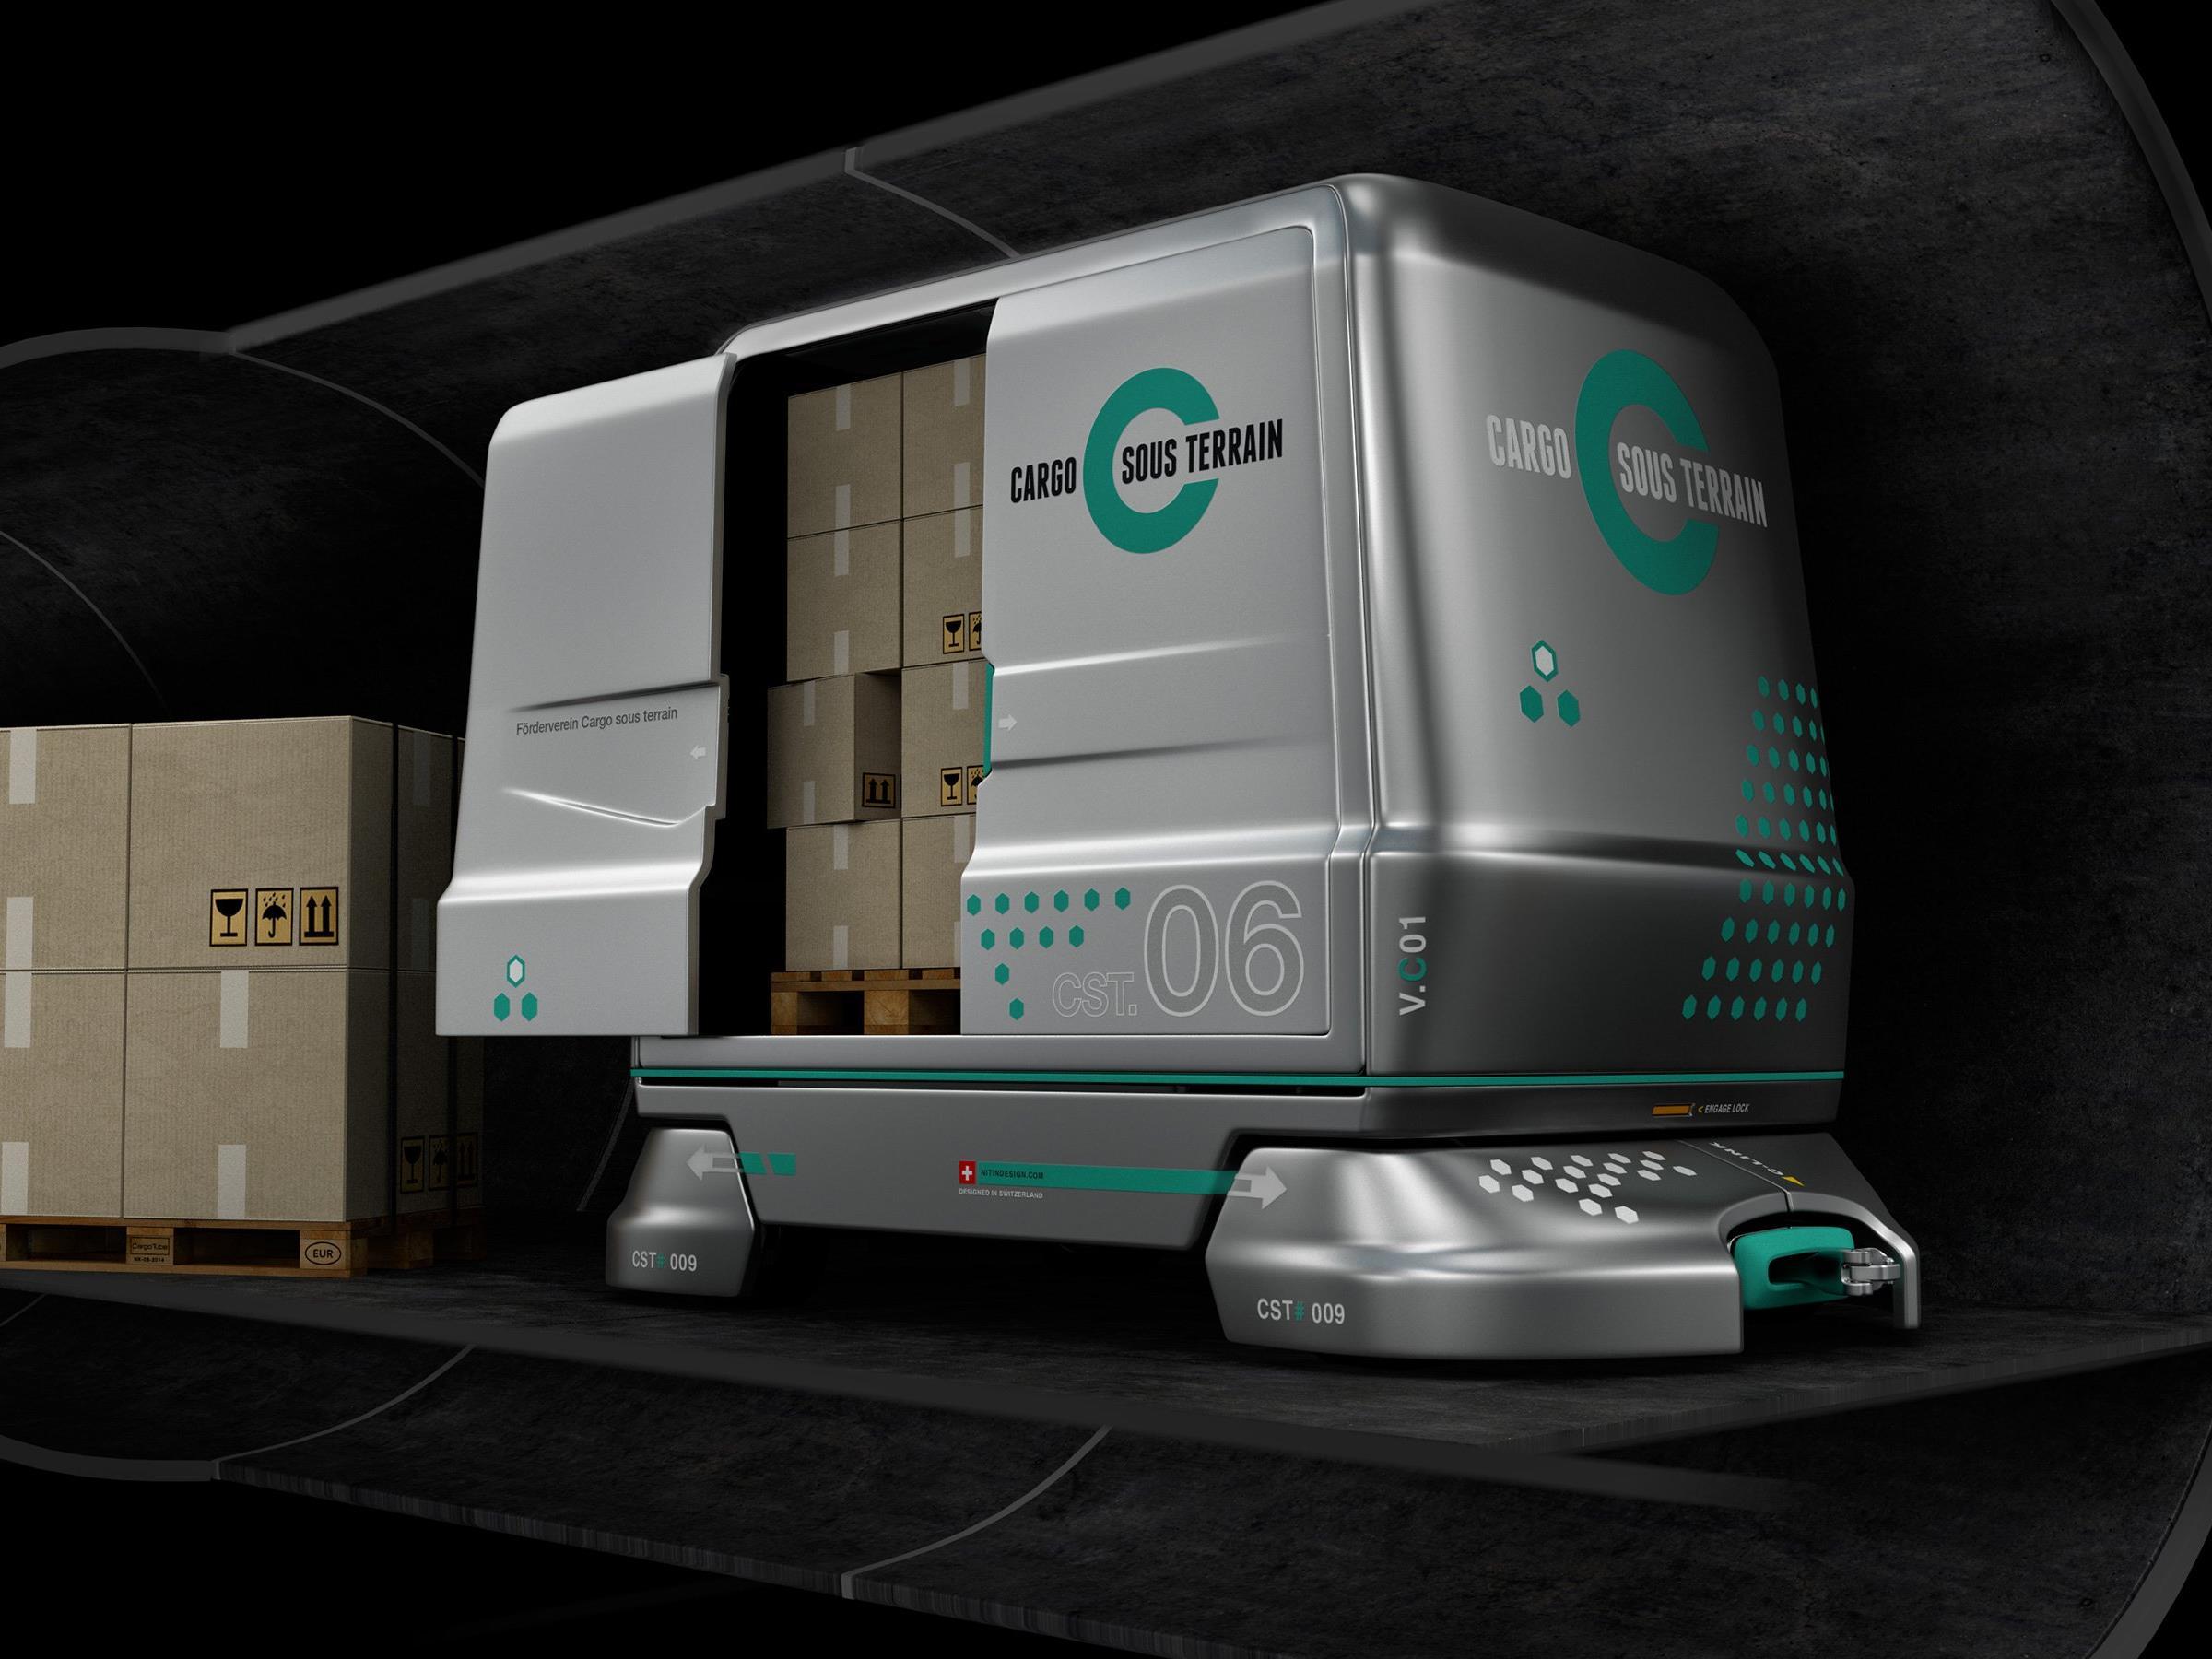 Cargo sous terrain Fahrzeuge transpo r- tieren Waren durch den Tunnel.